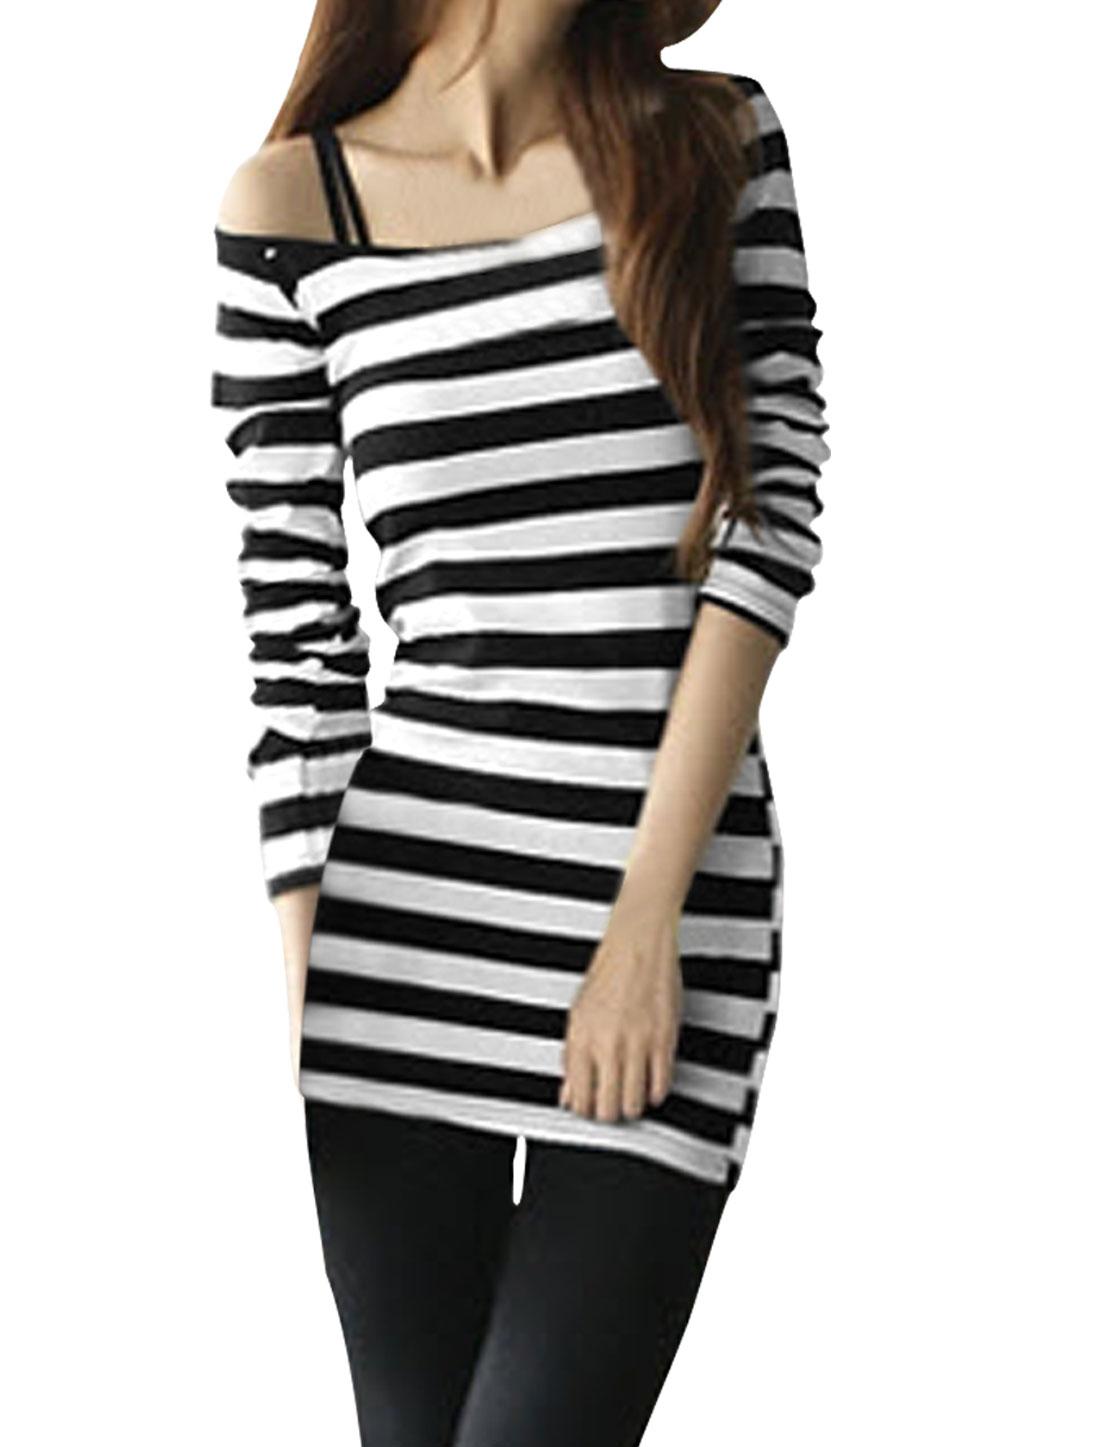 Ladies White Black Stripes Print Stretchy Pullover Tunic Shirt XS